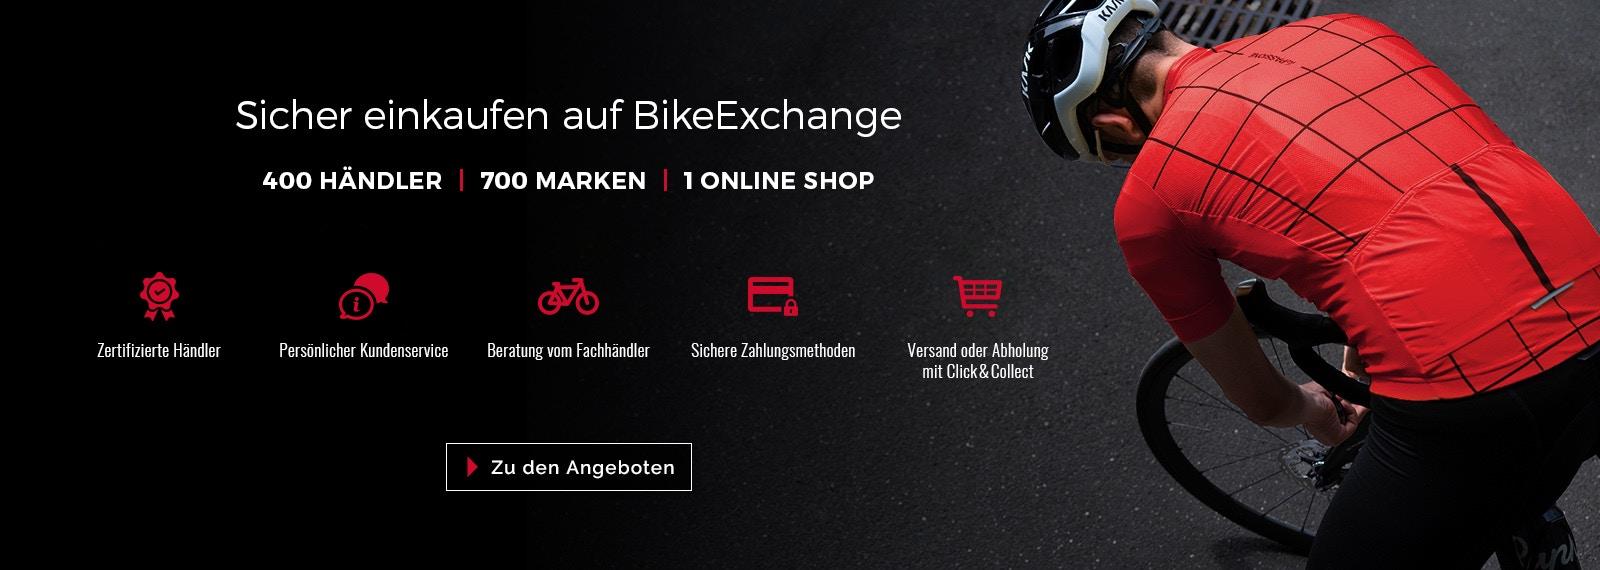 fahrrad online shop ber 700 marken auf bikeexchange. Black Bedroom Furniture Sets. Home Design Ideas